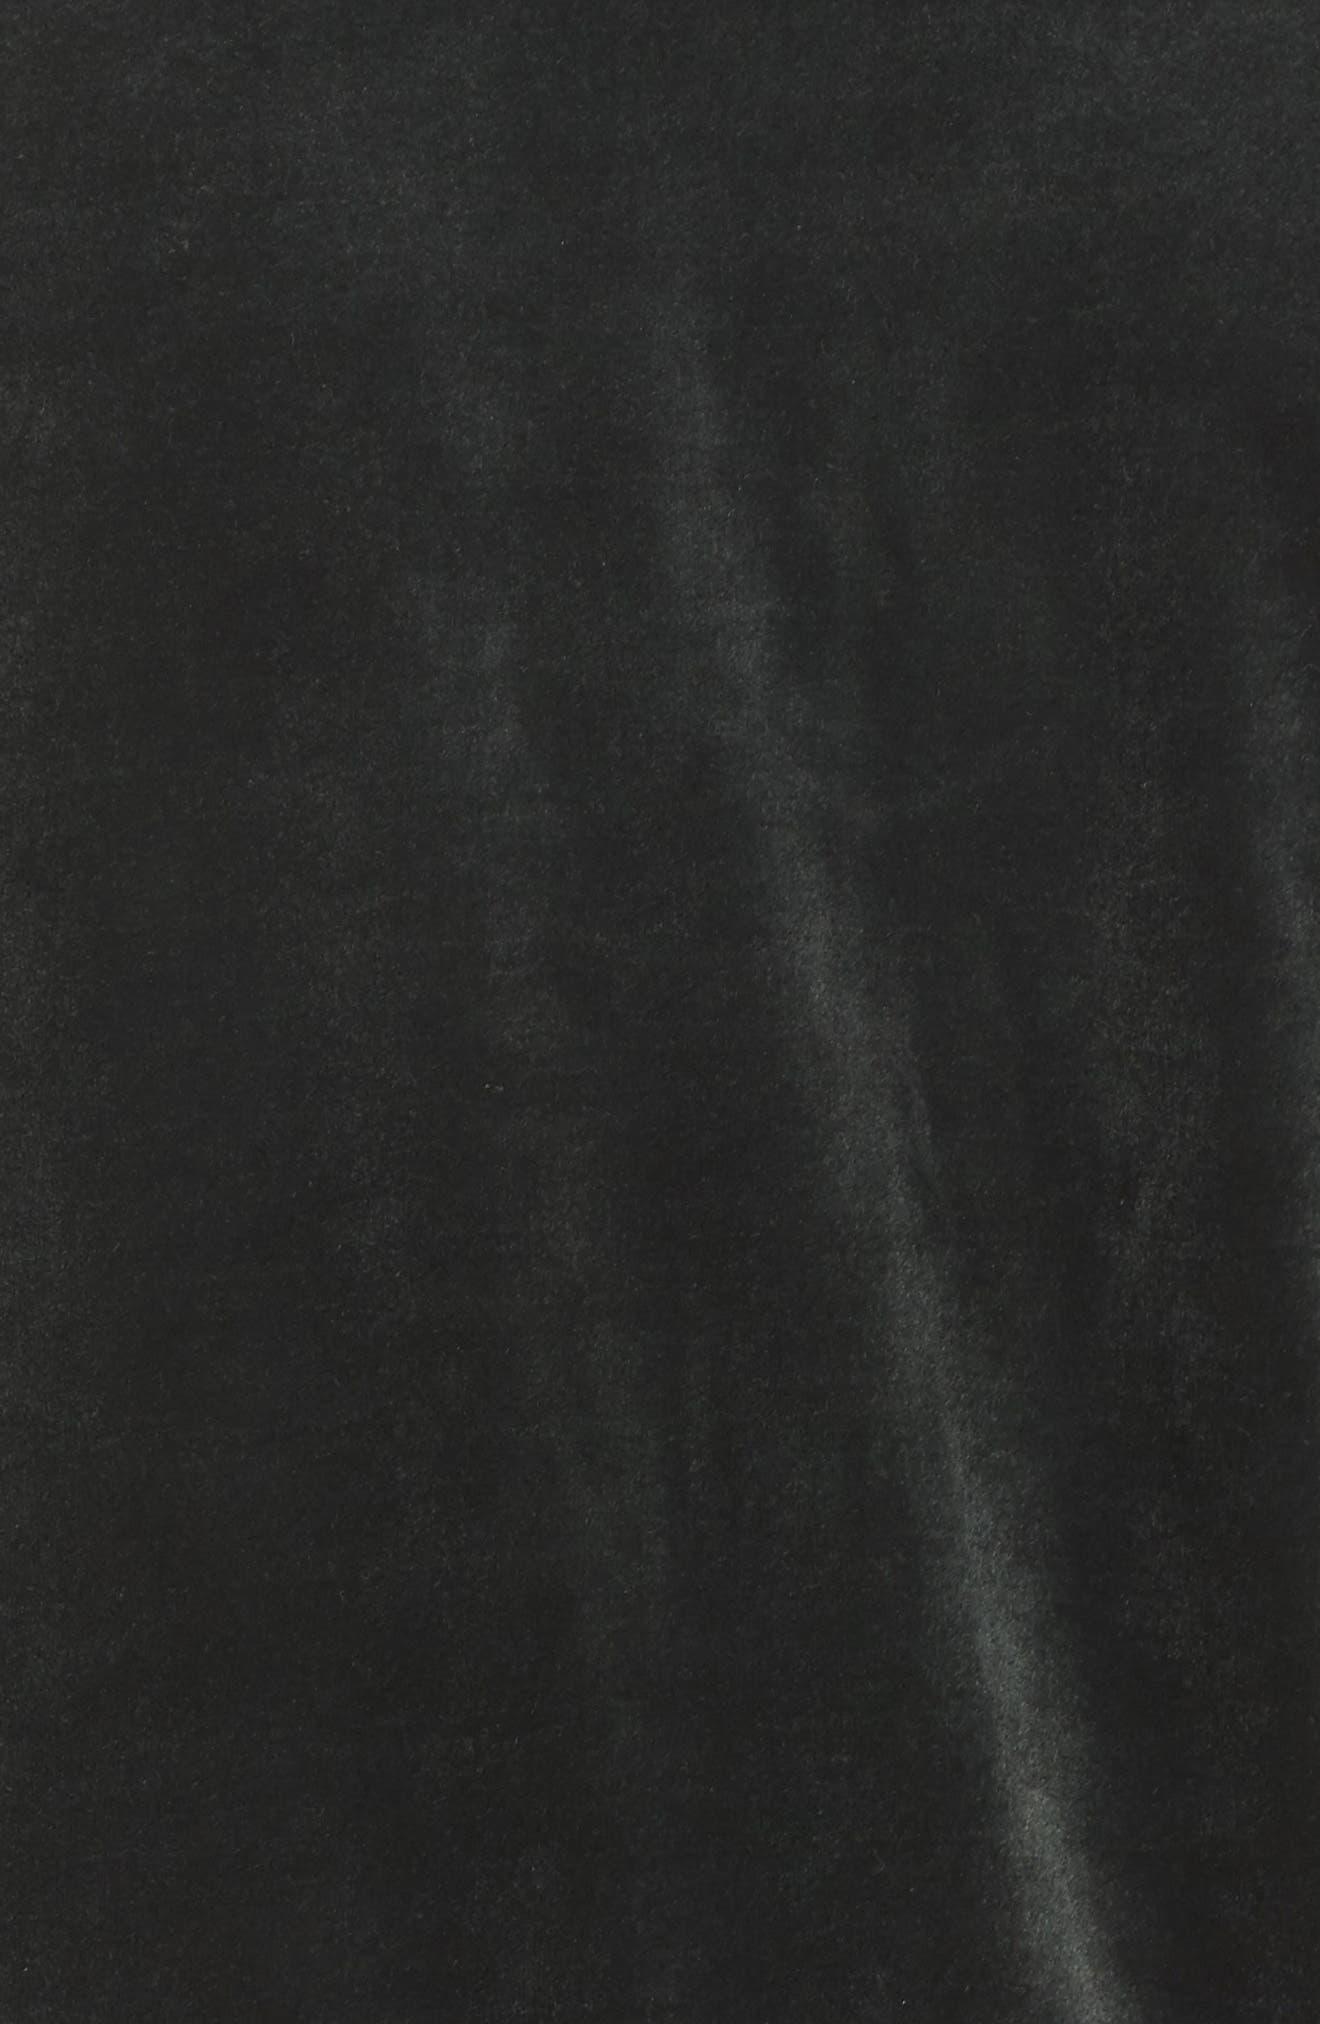 Velour Jacket,                             Alternate thumbnail 6, color,                             Outdoor Green/ Metallic Gold